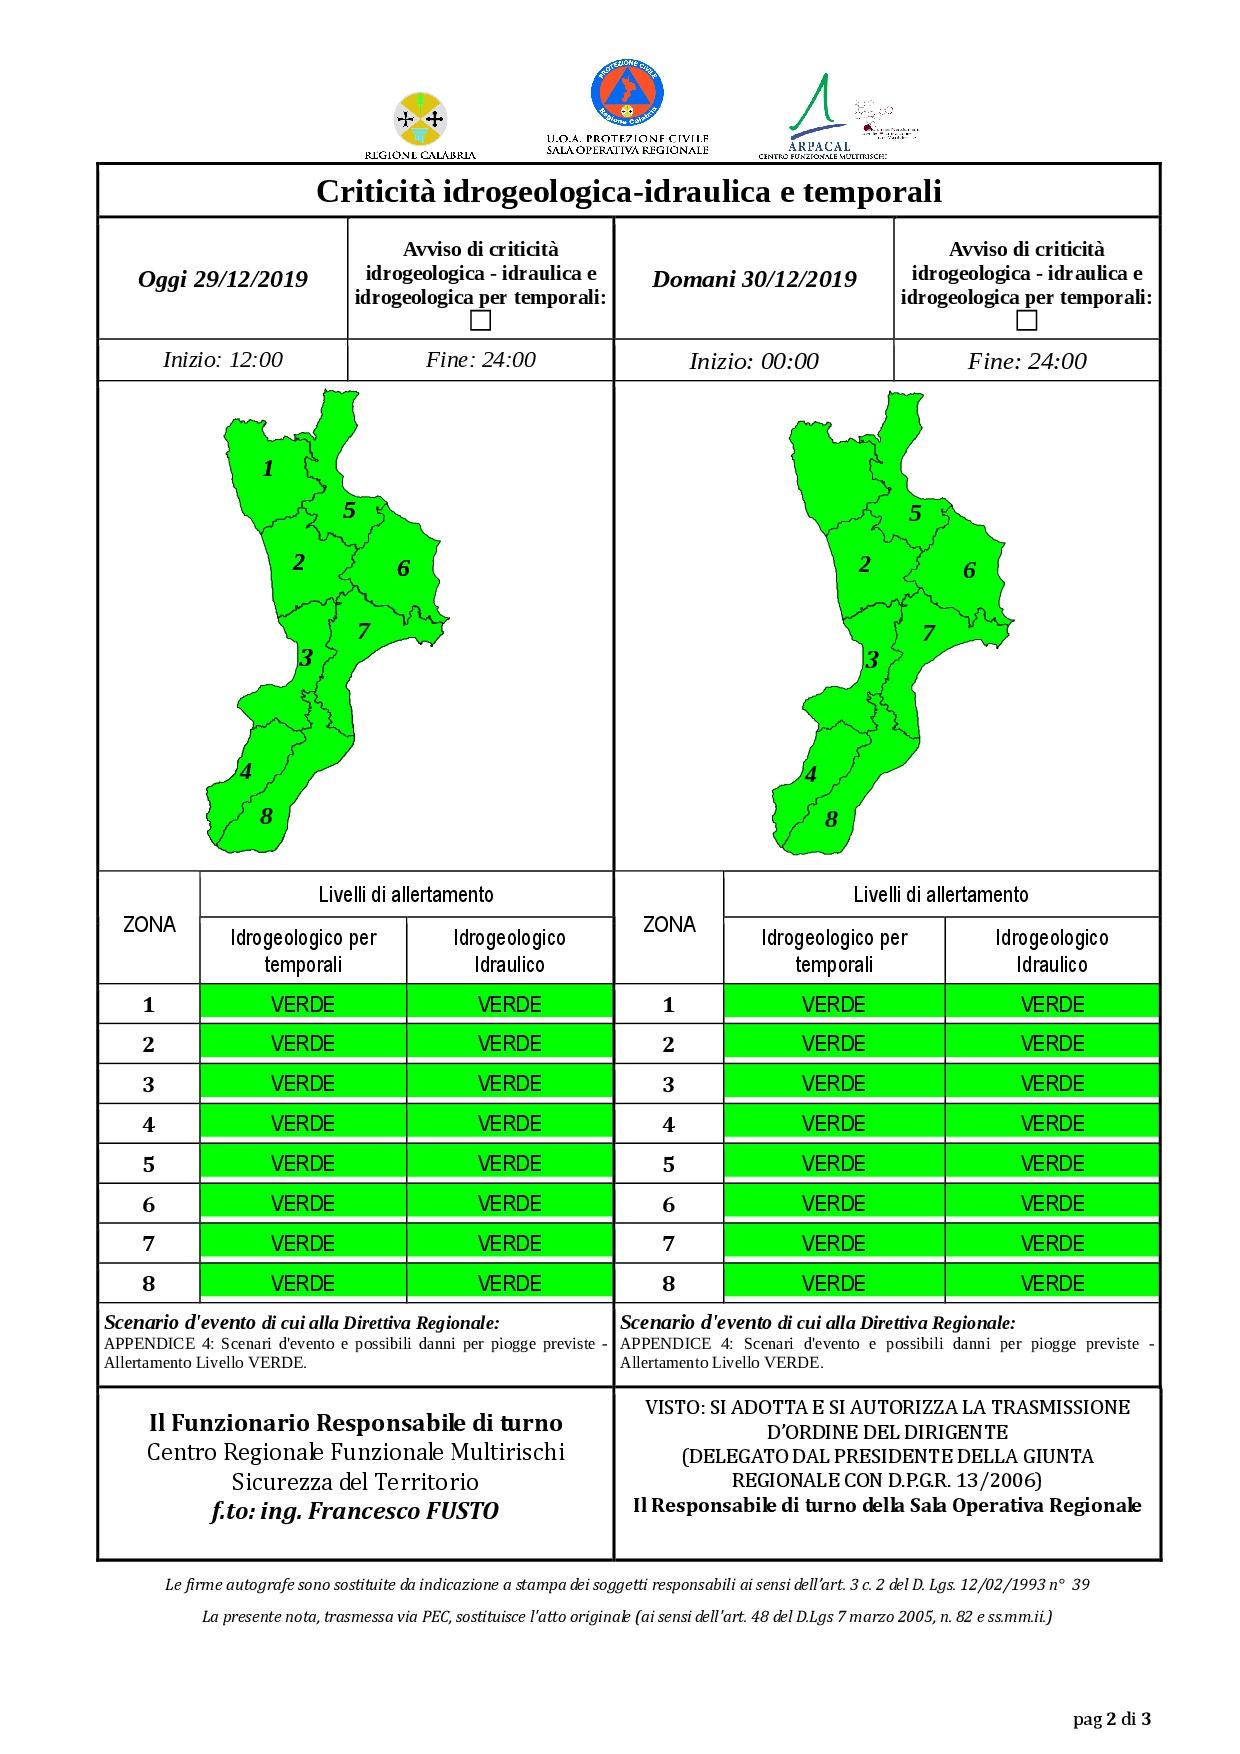 Criticità idrogeologica-idraulica e temporali in Calabria 29-12-2019